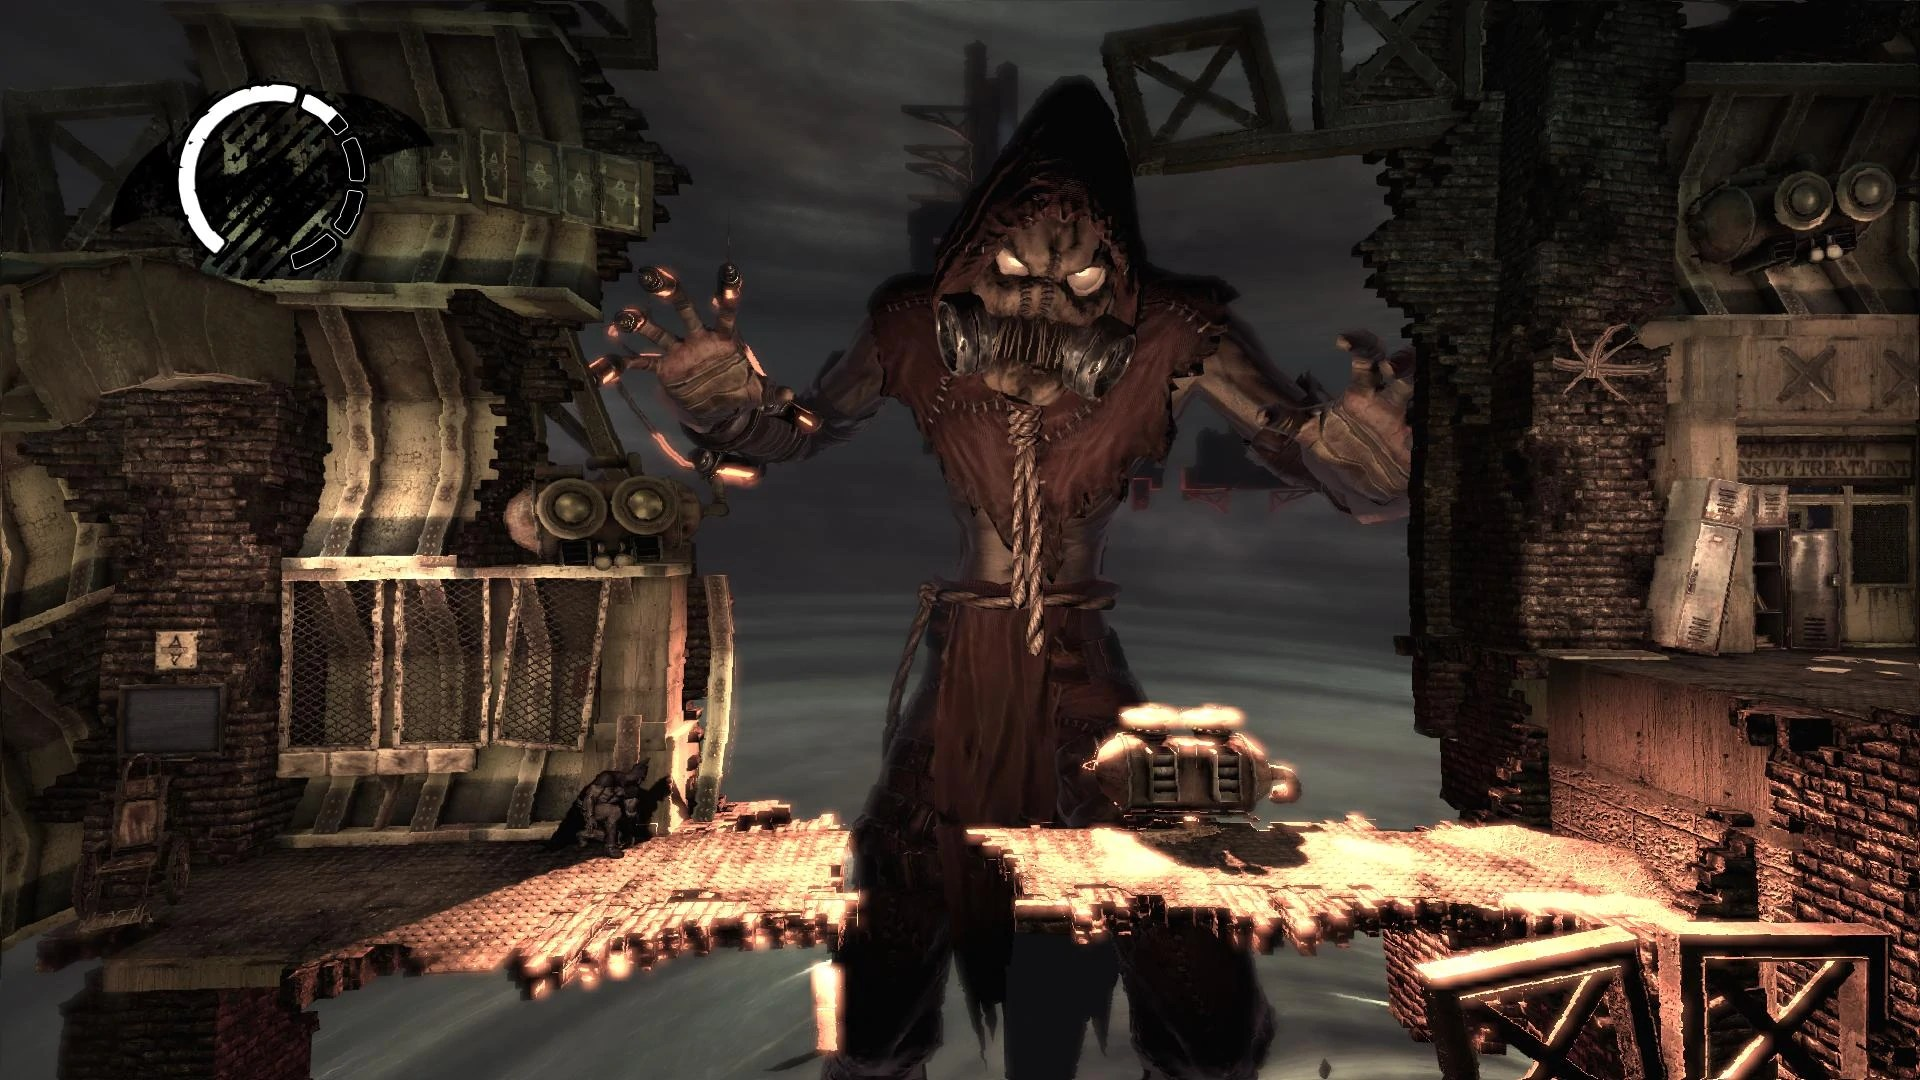 https://i1.wp.com/images.wikia.com/batman/images/f/f4/Batman-arkham-asylum-scarecrow.jpg